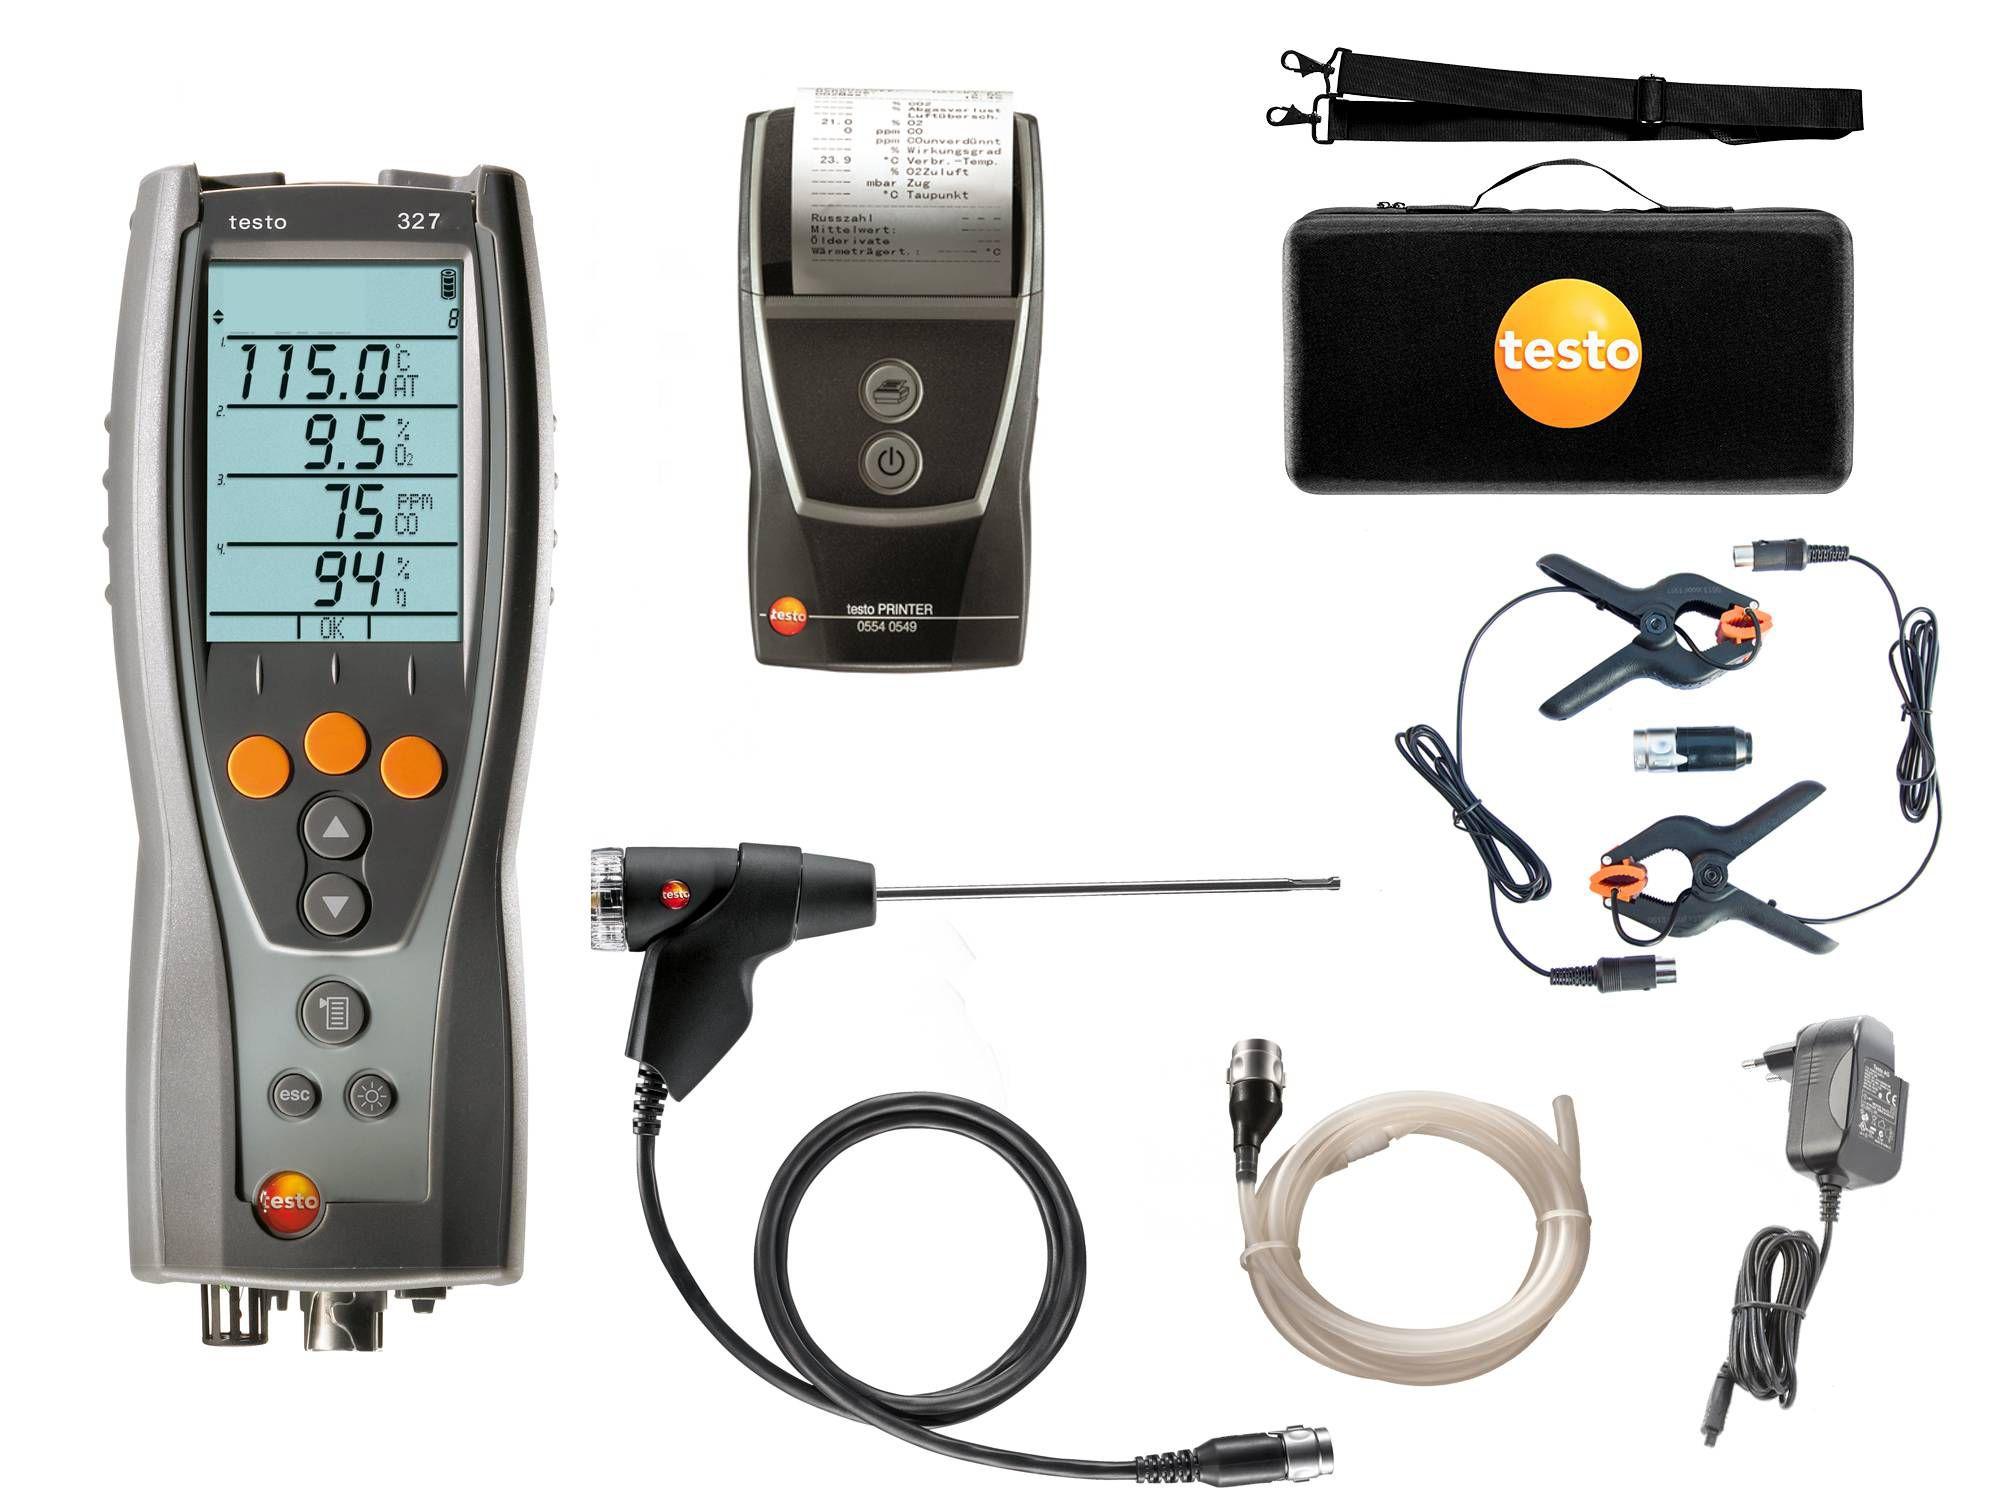 testo-327-1-Advanced-Kit-0563-3203-81.jpg